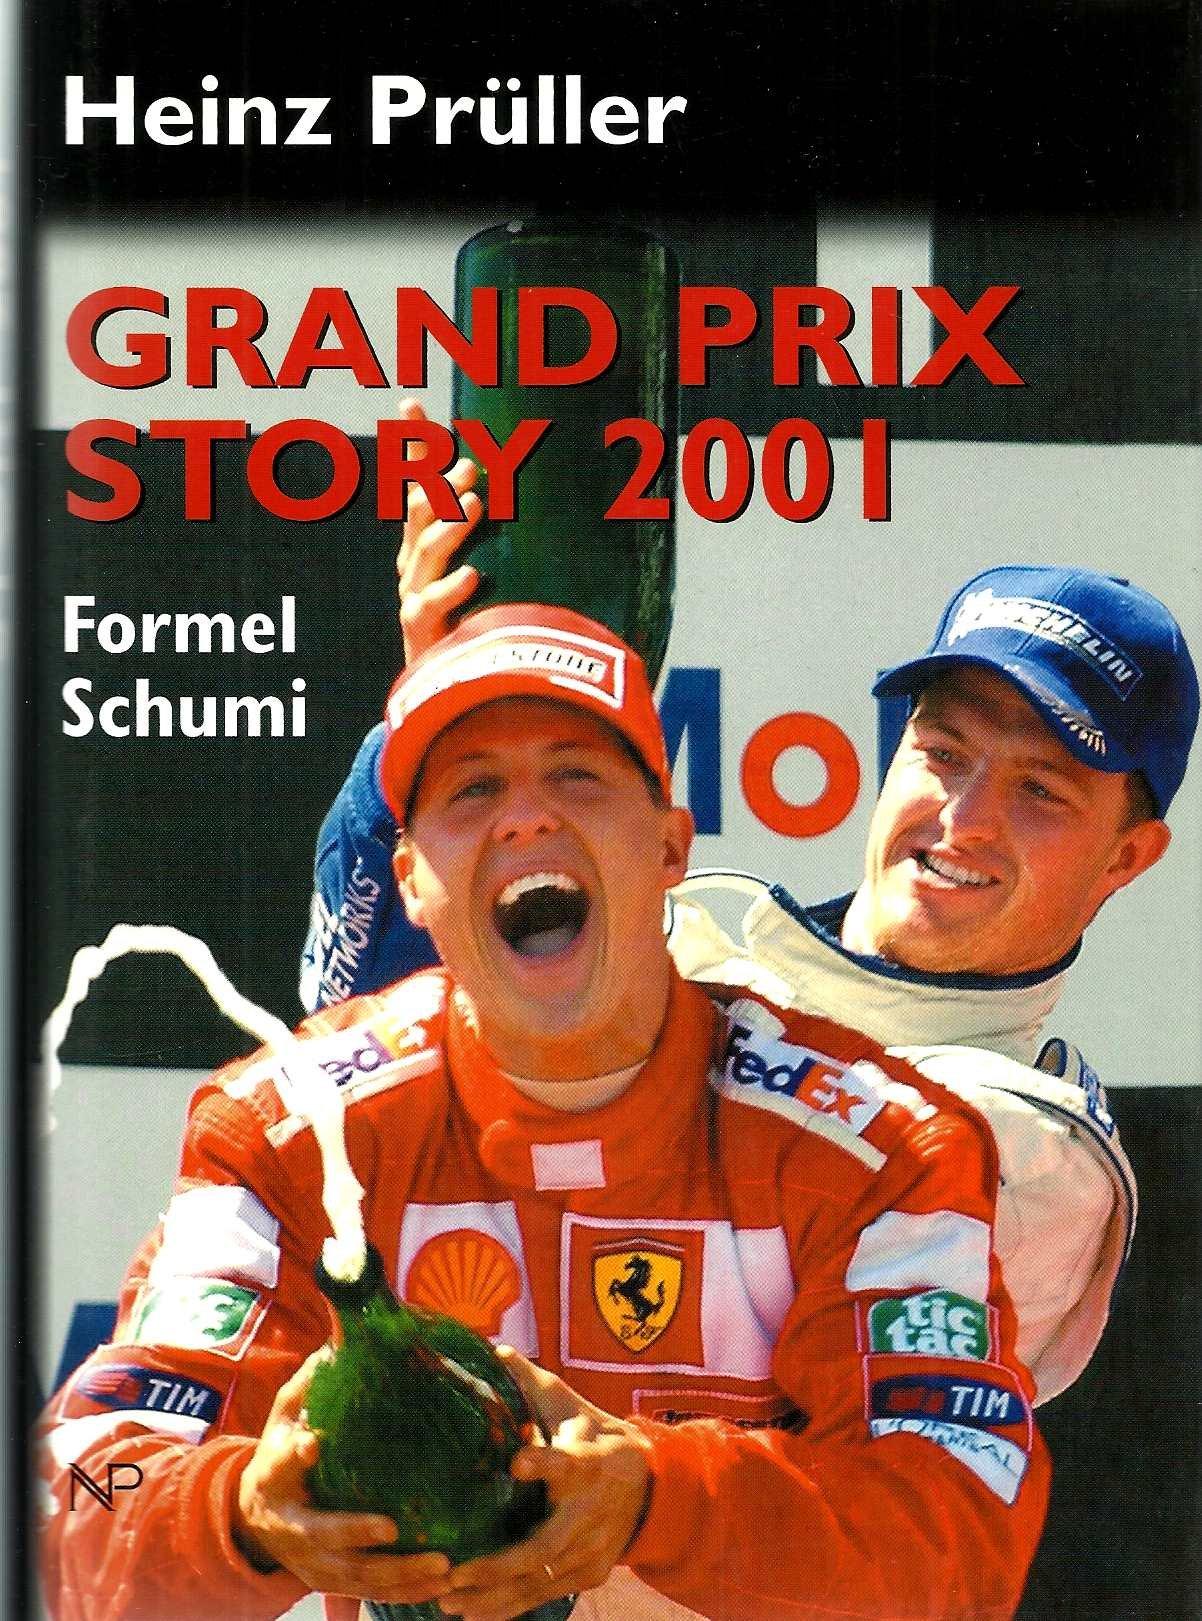 Grand Prix Story 2001. Formel Schumi